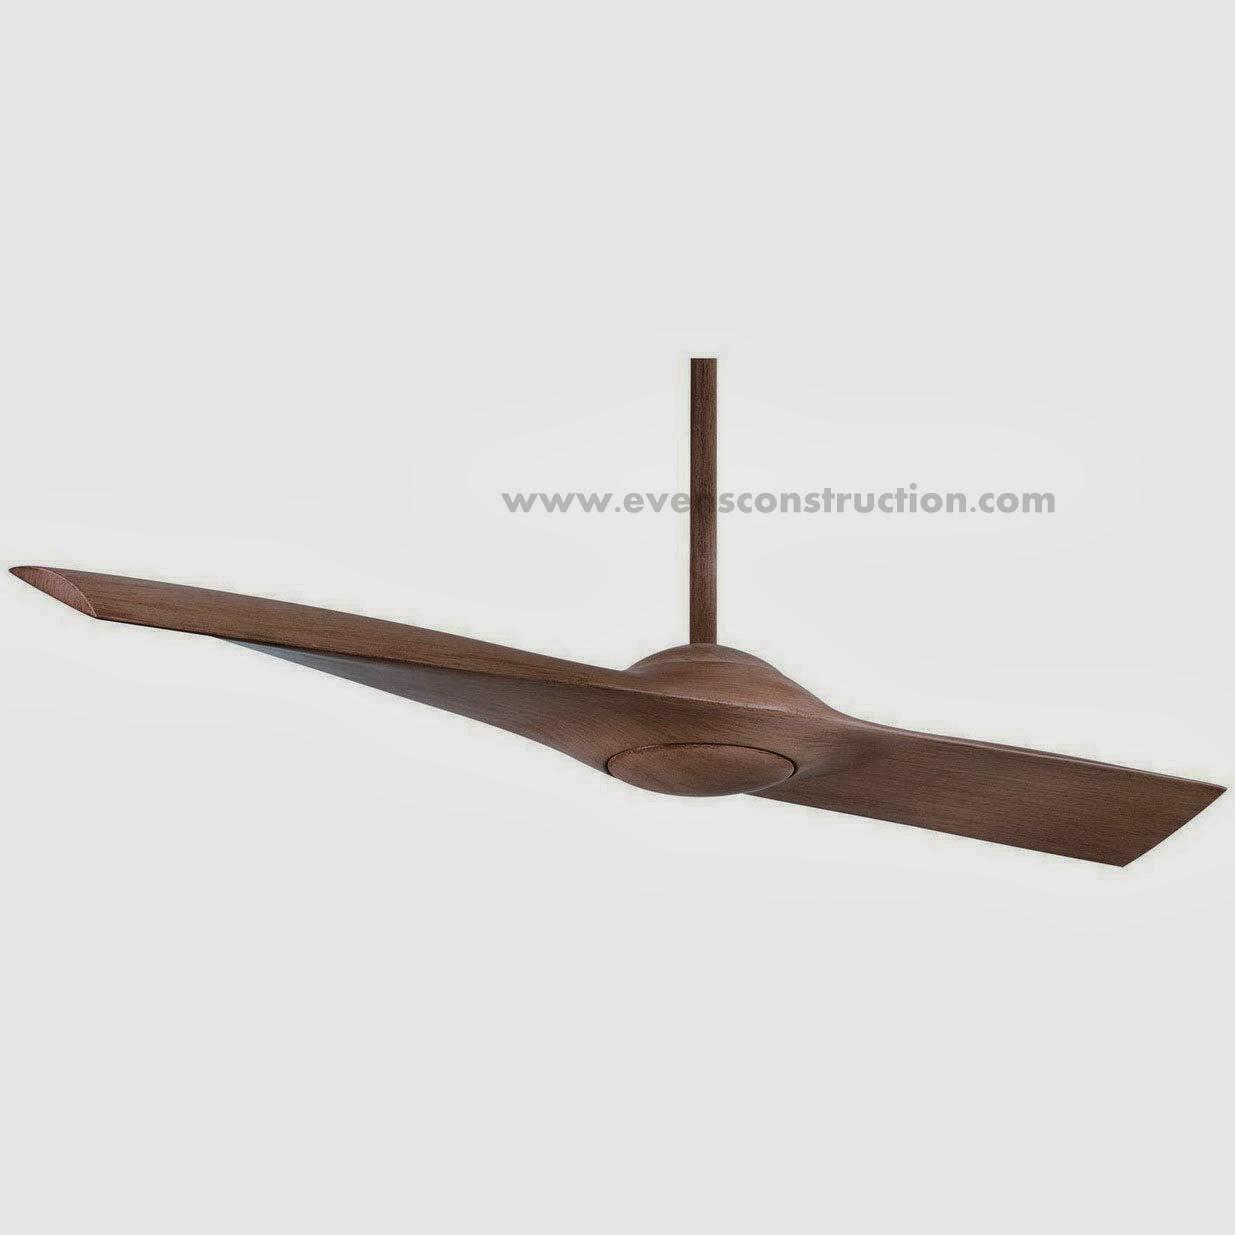 Ceiling Fan Design : Evens construction pvt ltd modern ceiling fan designs